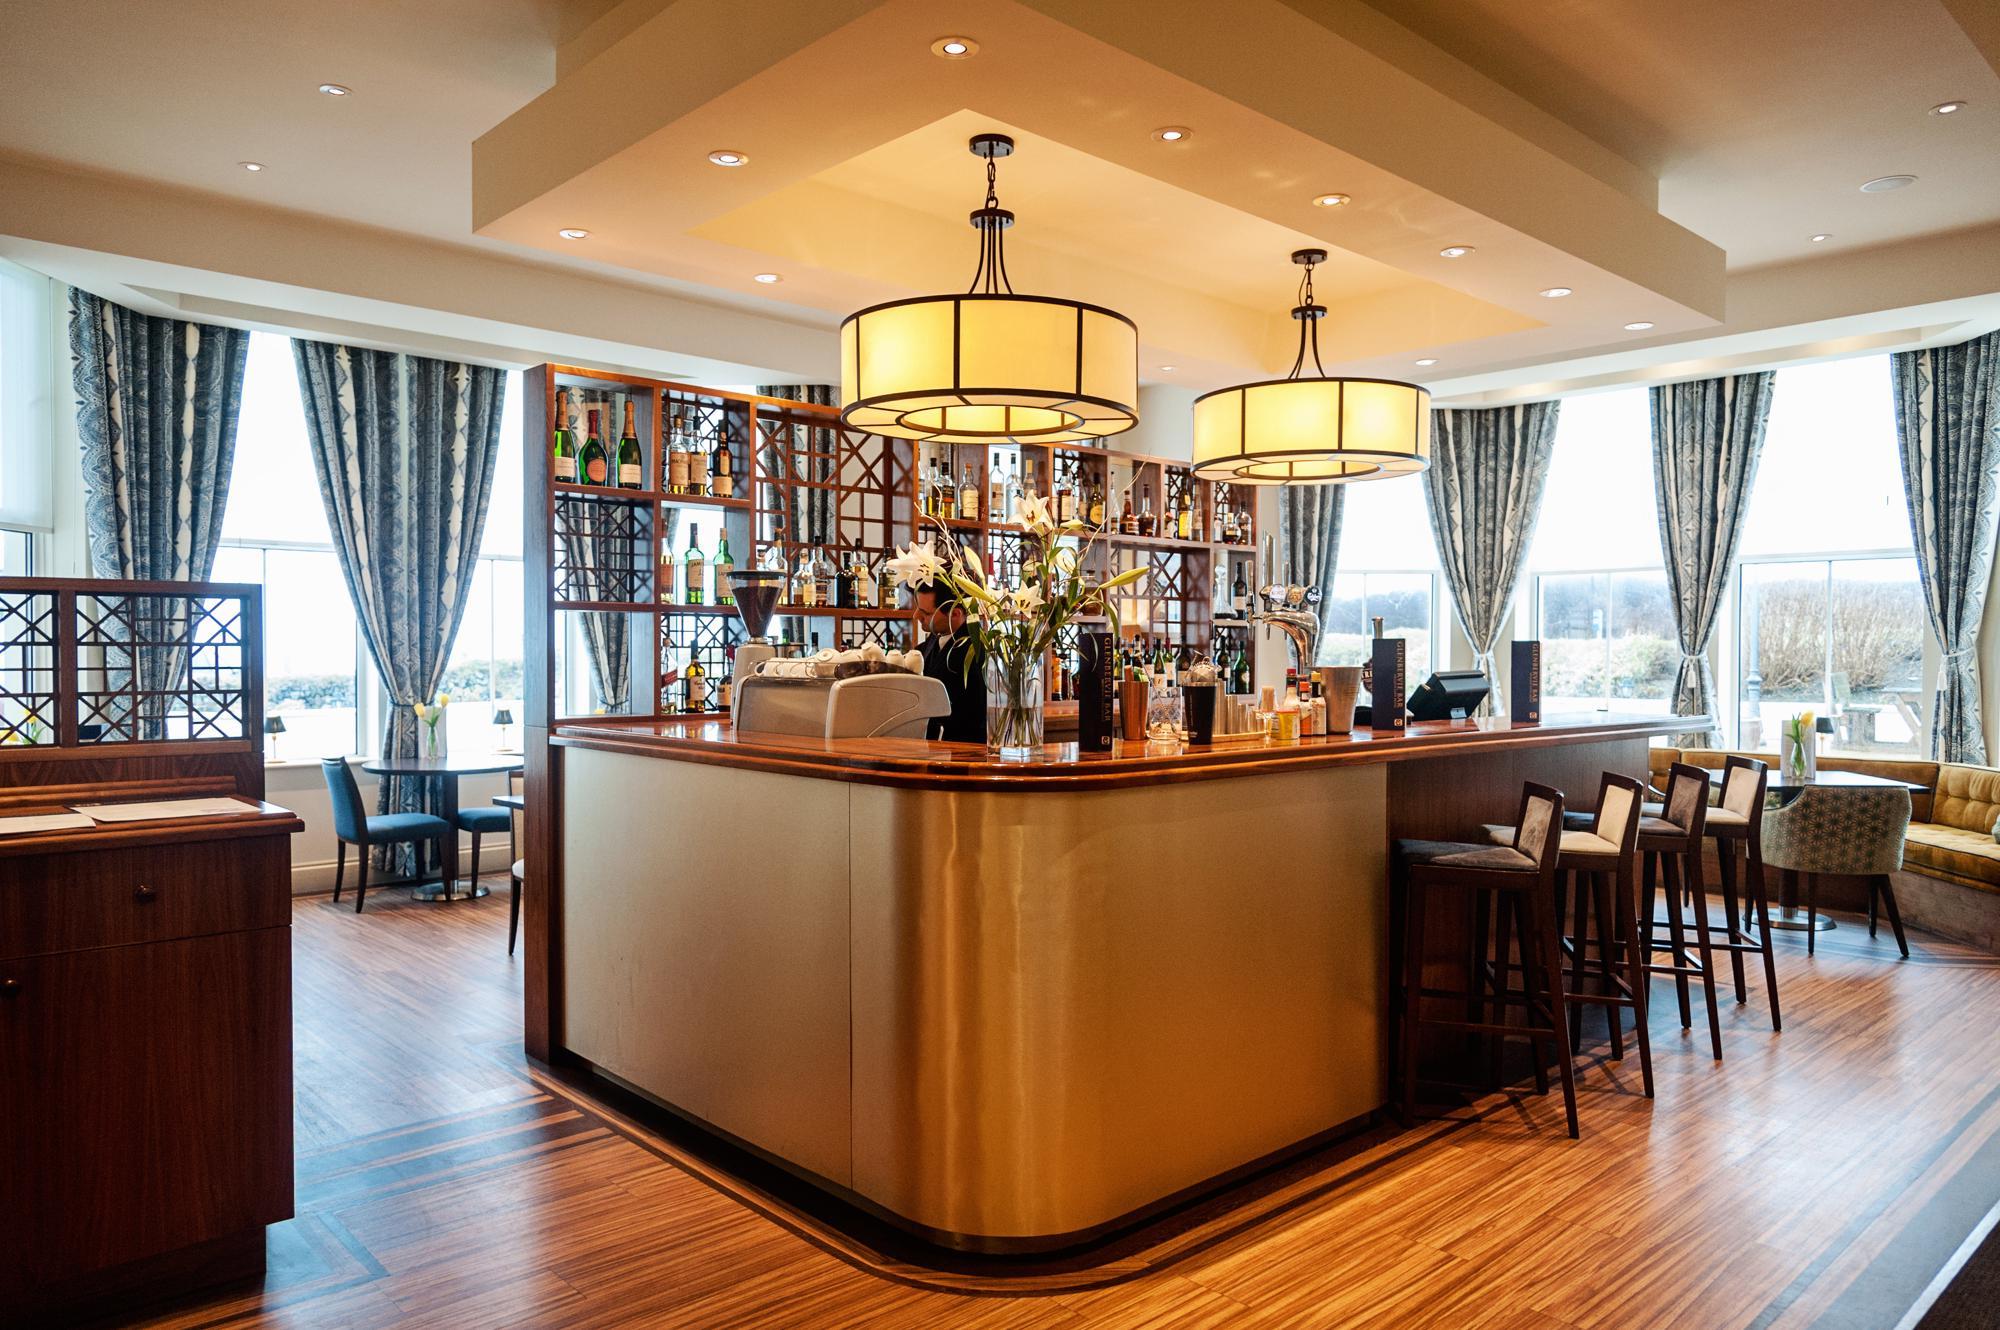 Mullion Cove Hotel Bar and Restaurant